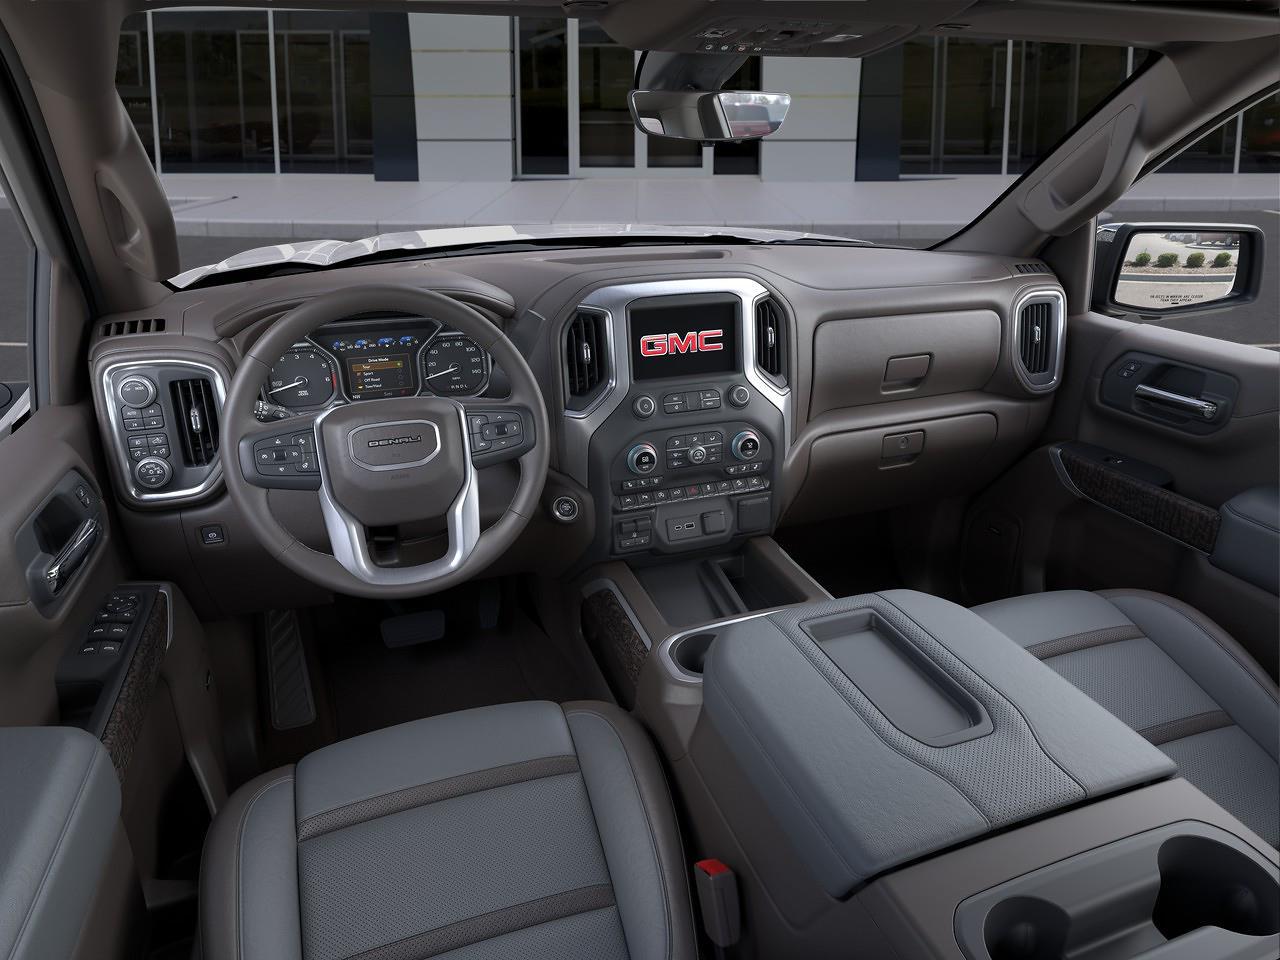 2021 GMC Sierra 1500 Crew Cab 4x4, Pickup #217054 - photo 12